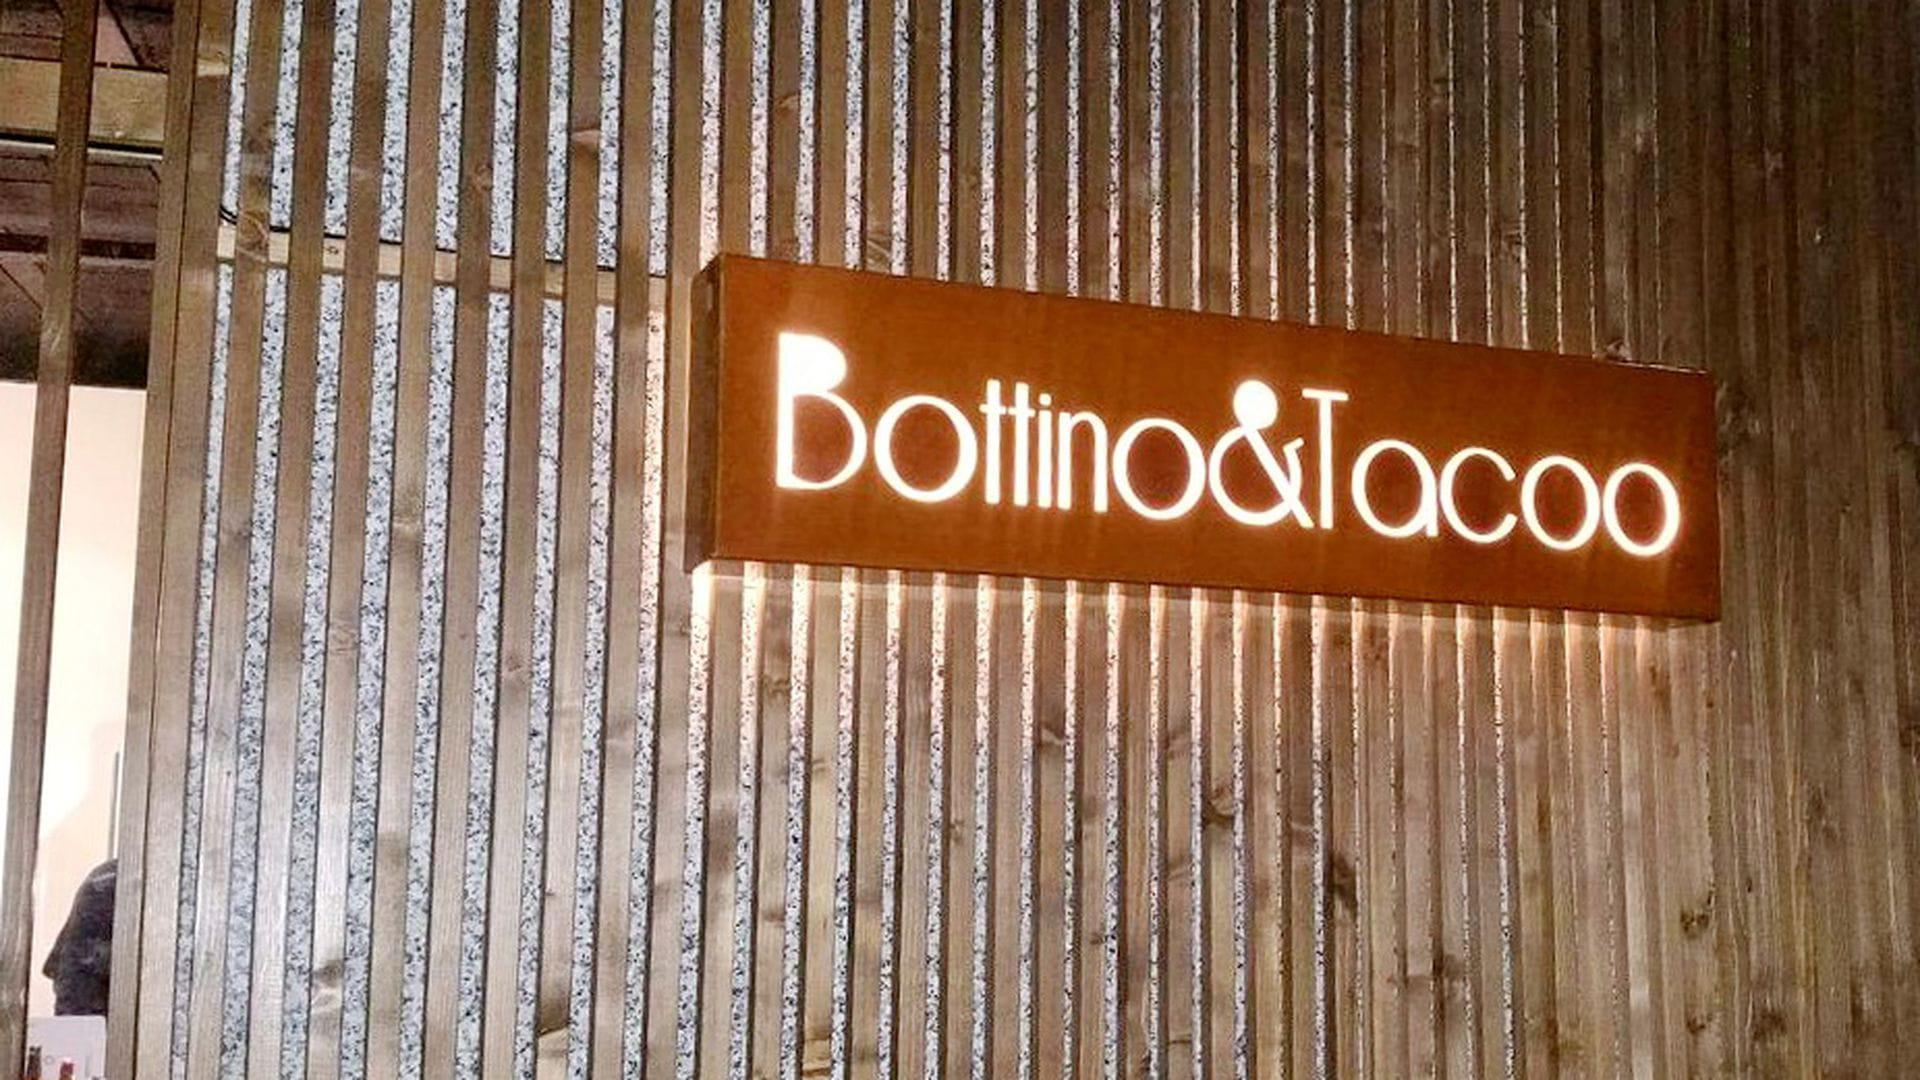 Bottino and Tacco